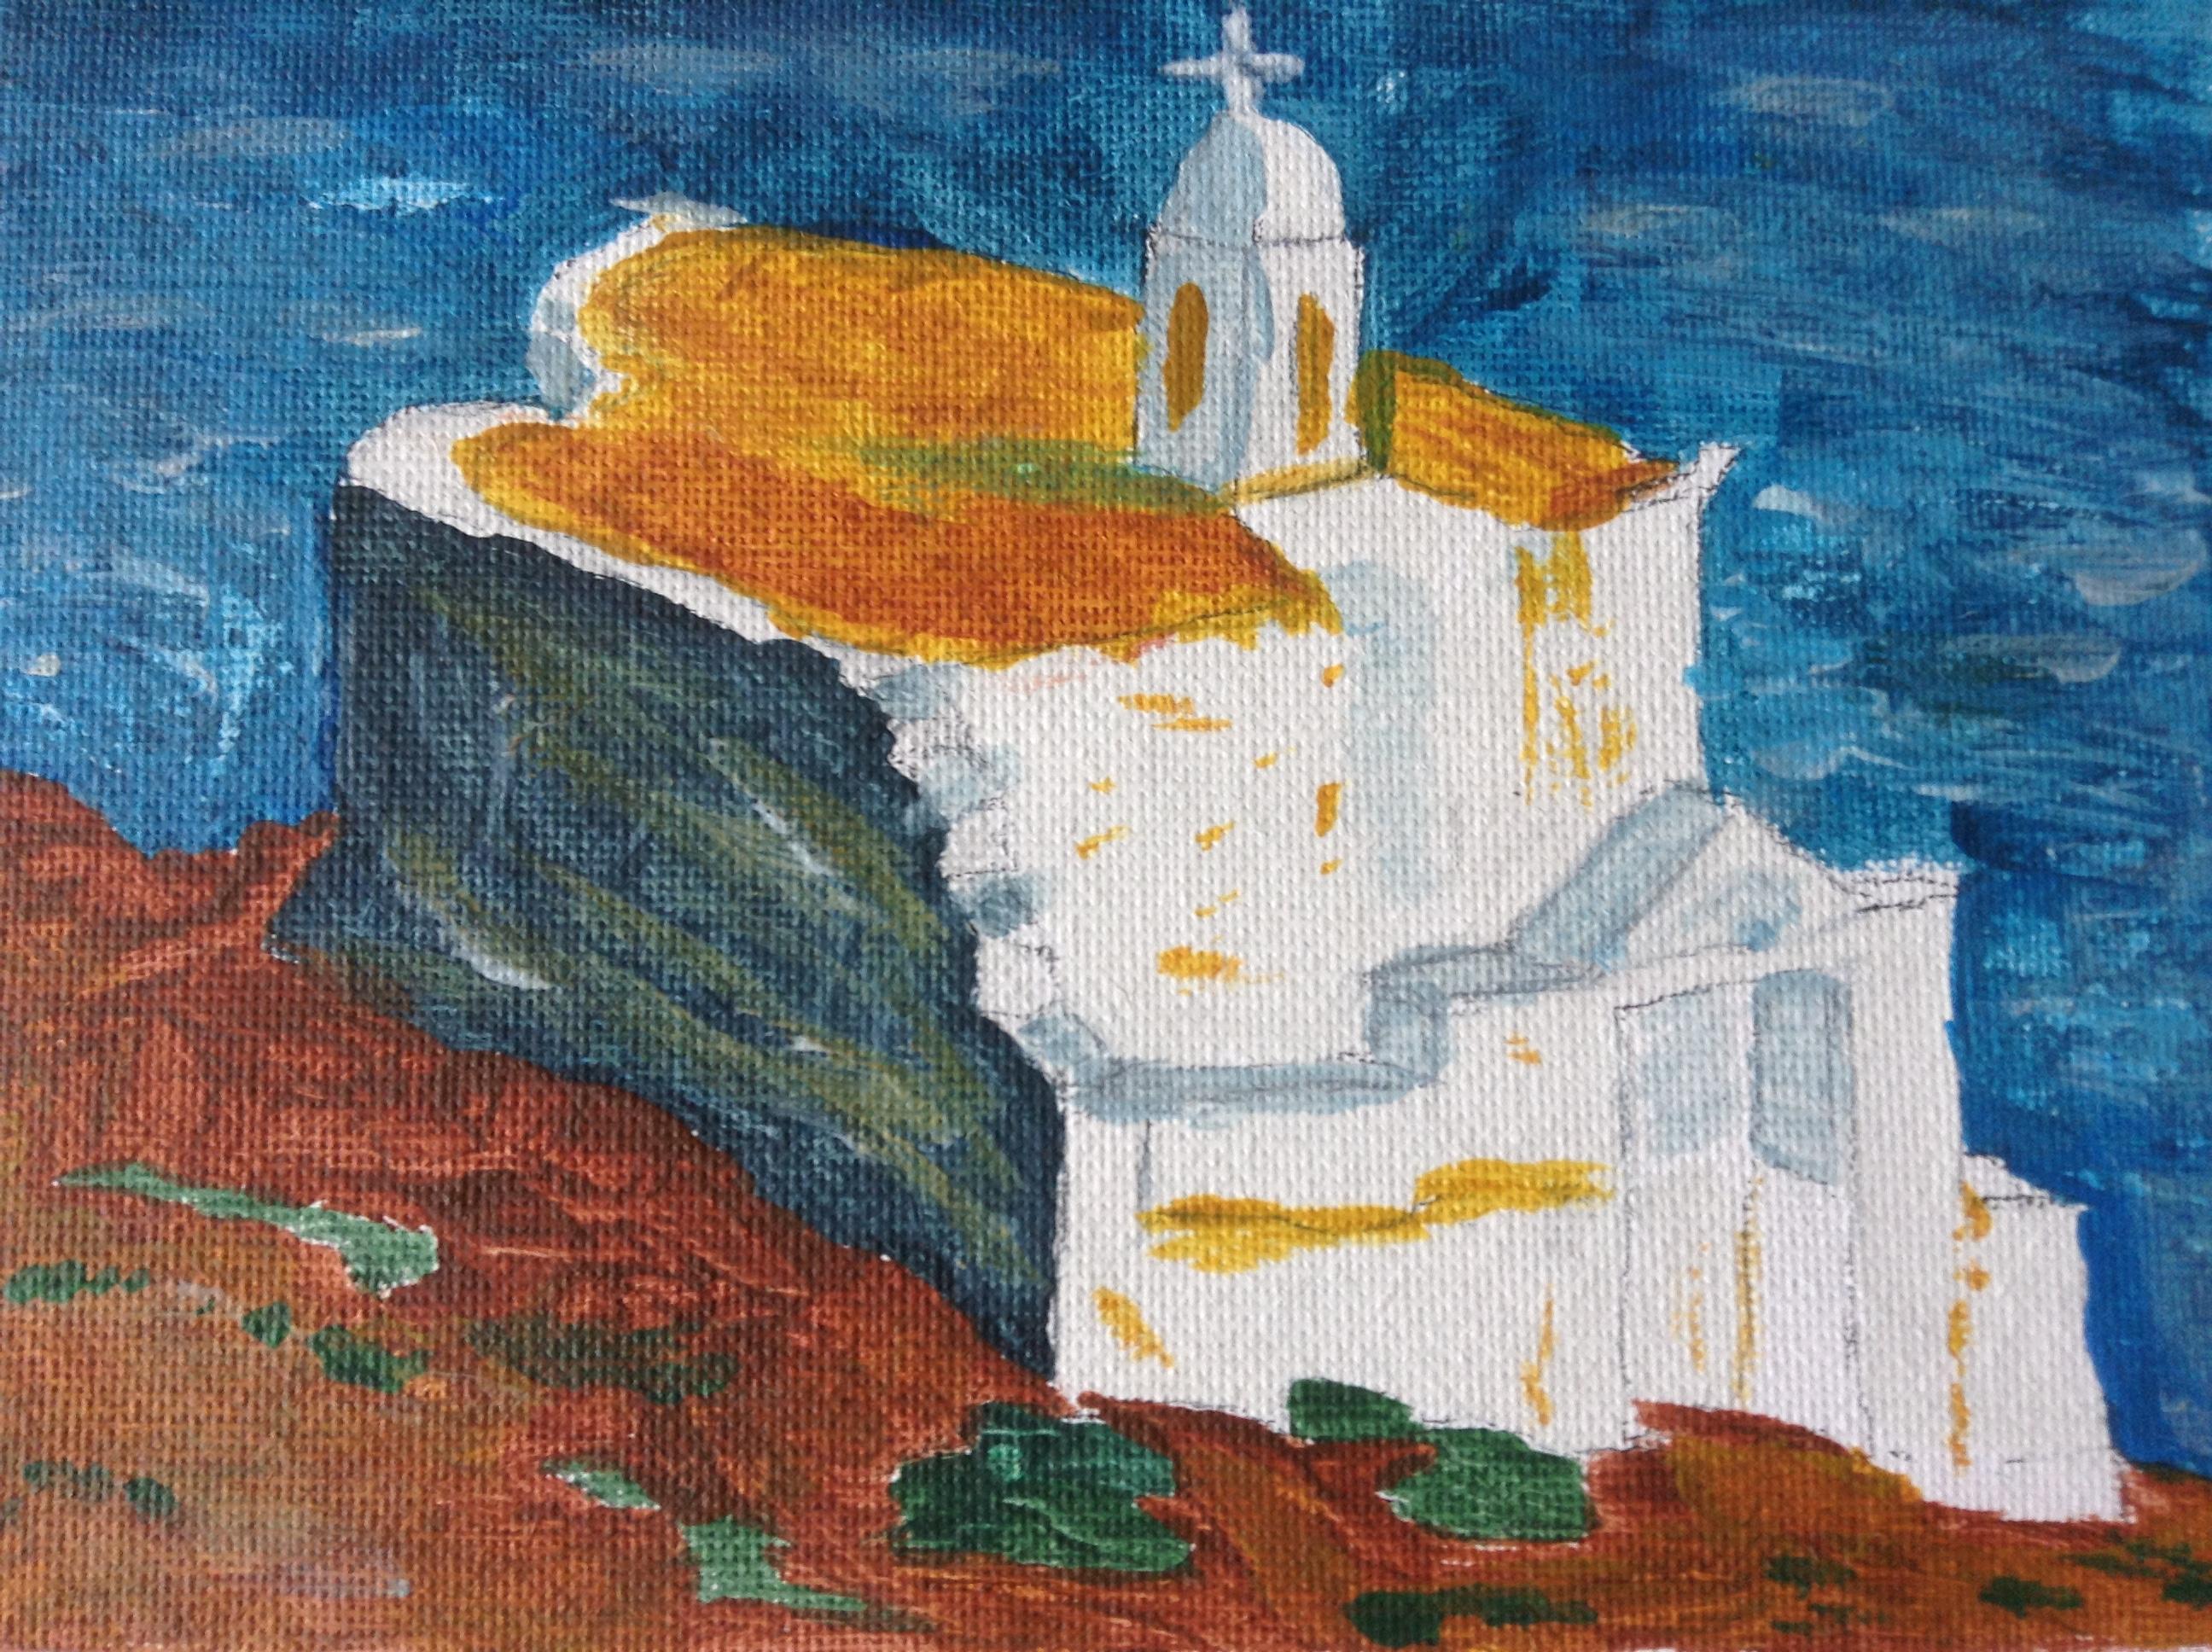 Little Church of St. Marc, Tinos Island Greece